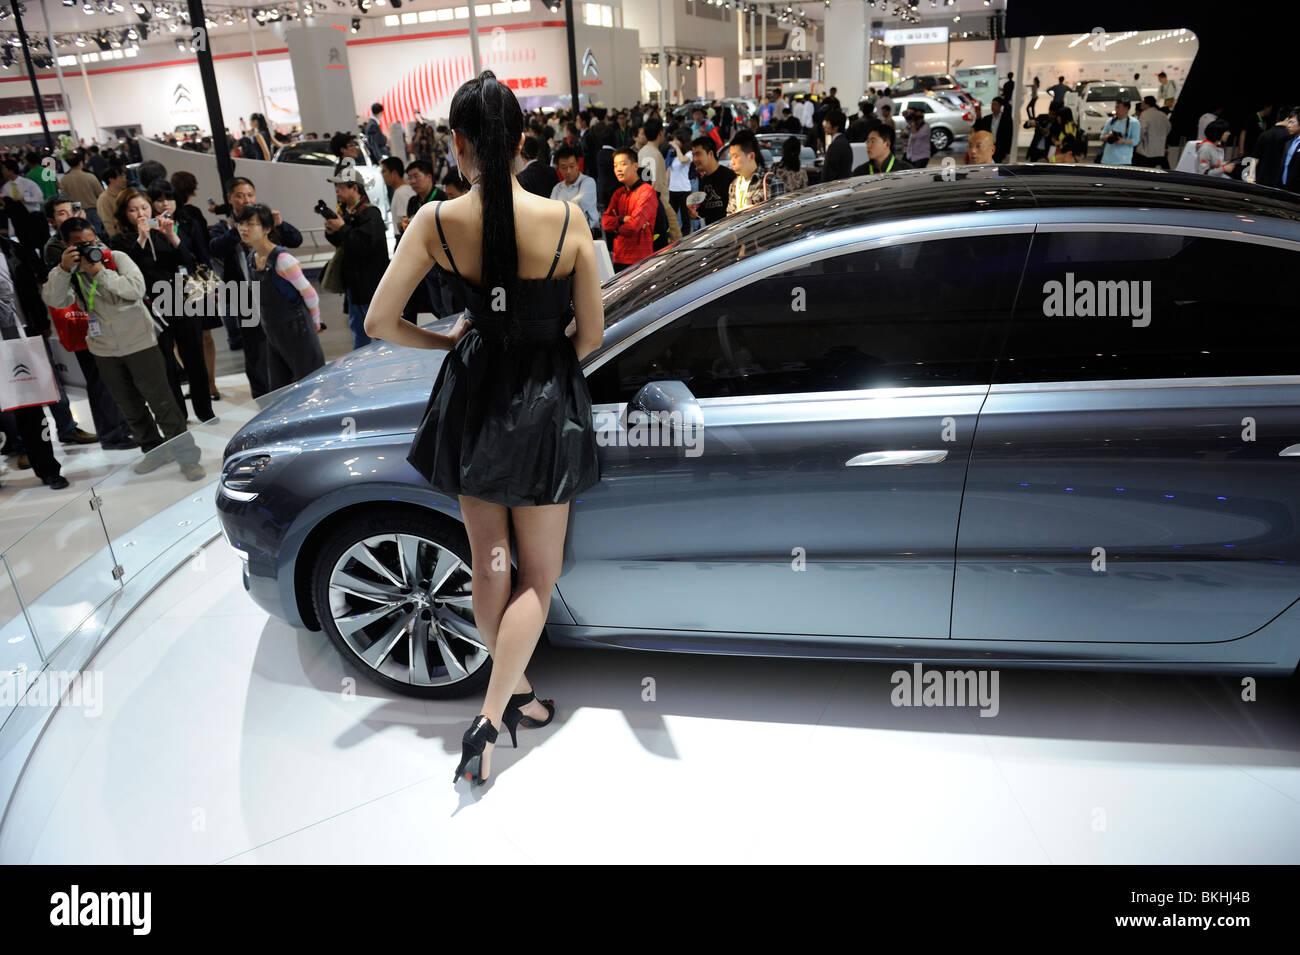 Un modelo supone un 5 por Peugeot concept en el Auto Show de Beijing. 24-Apr-2010 Imagen De Stock